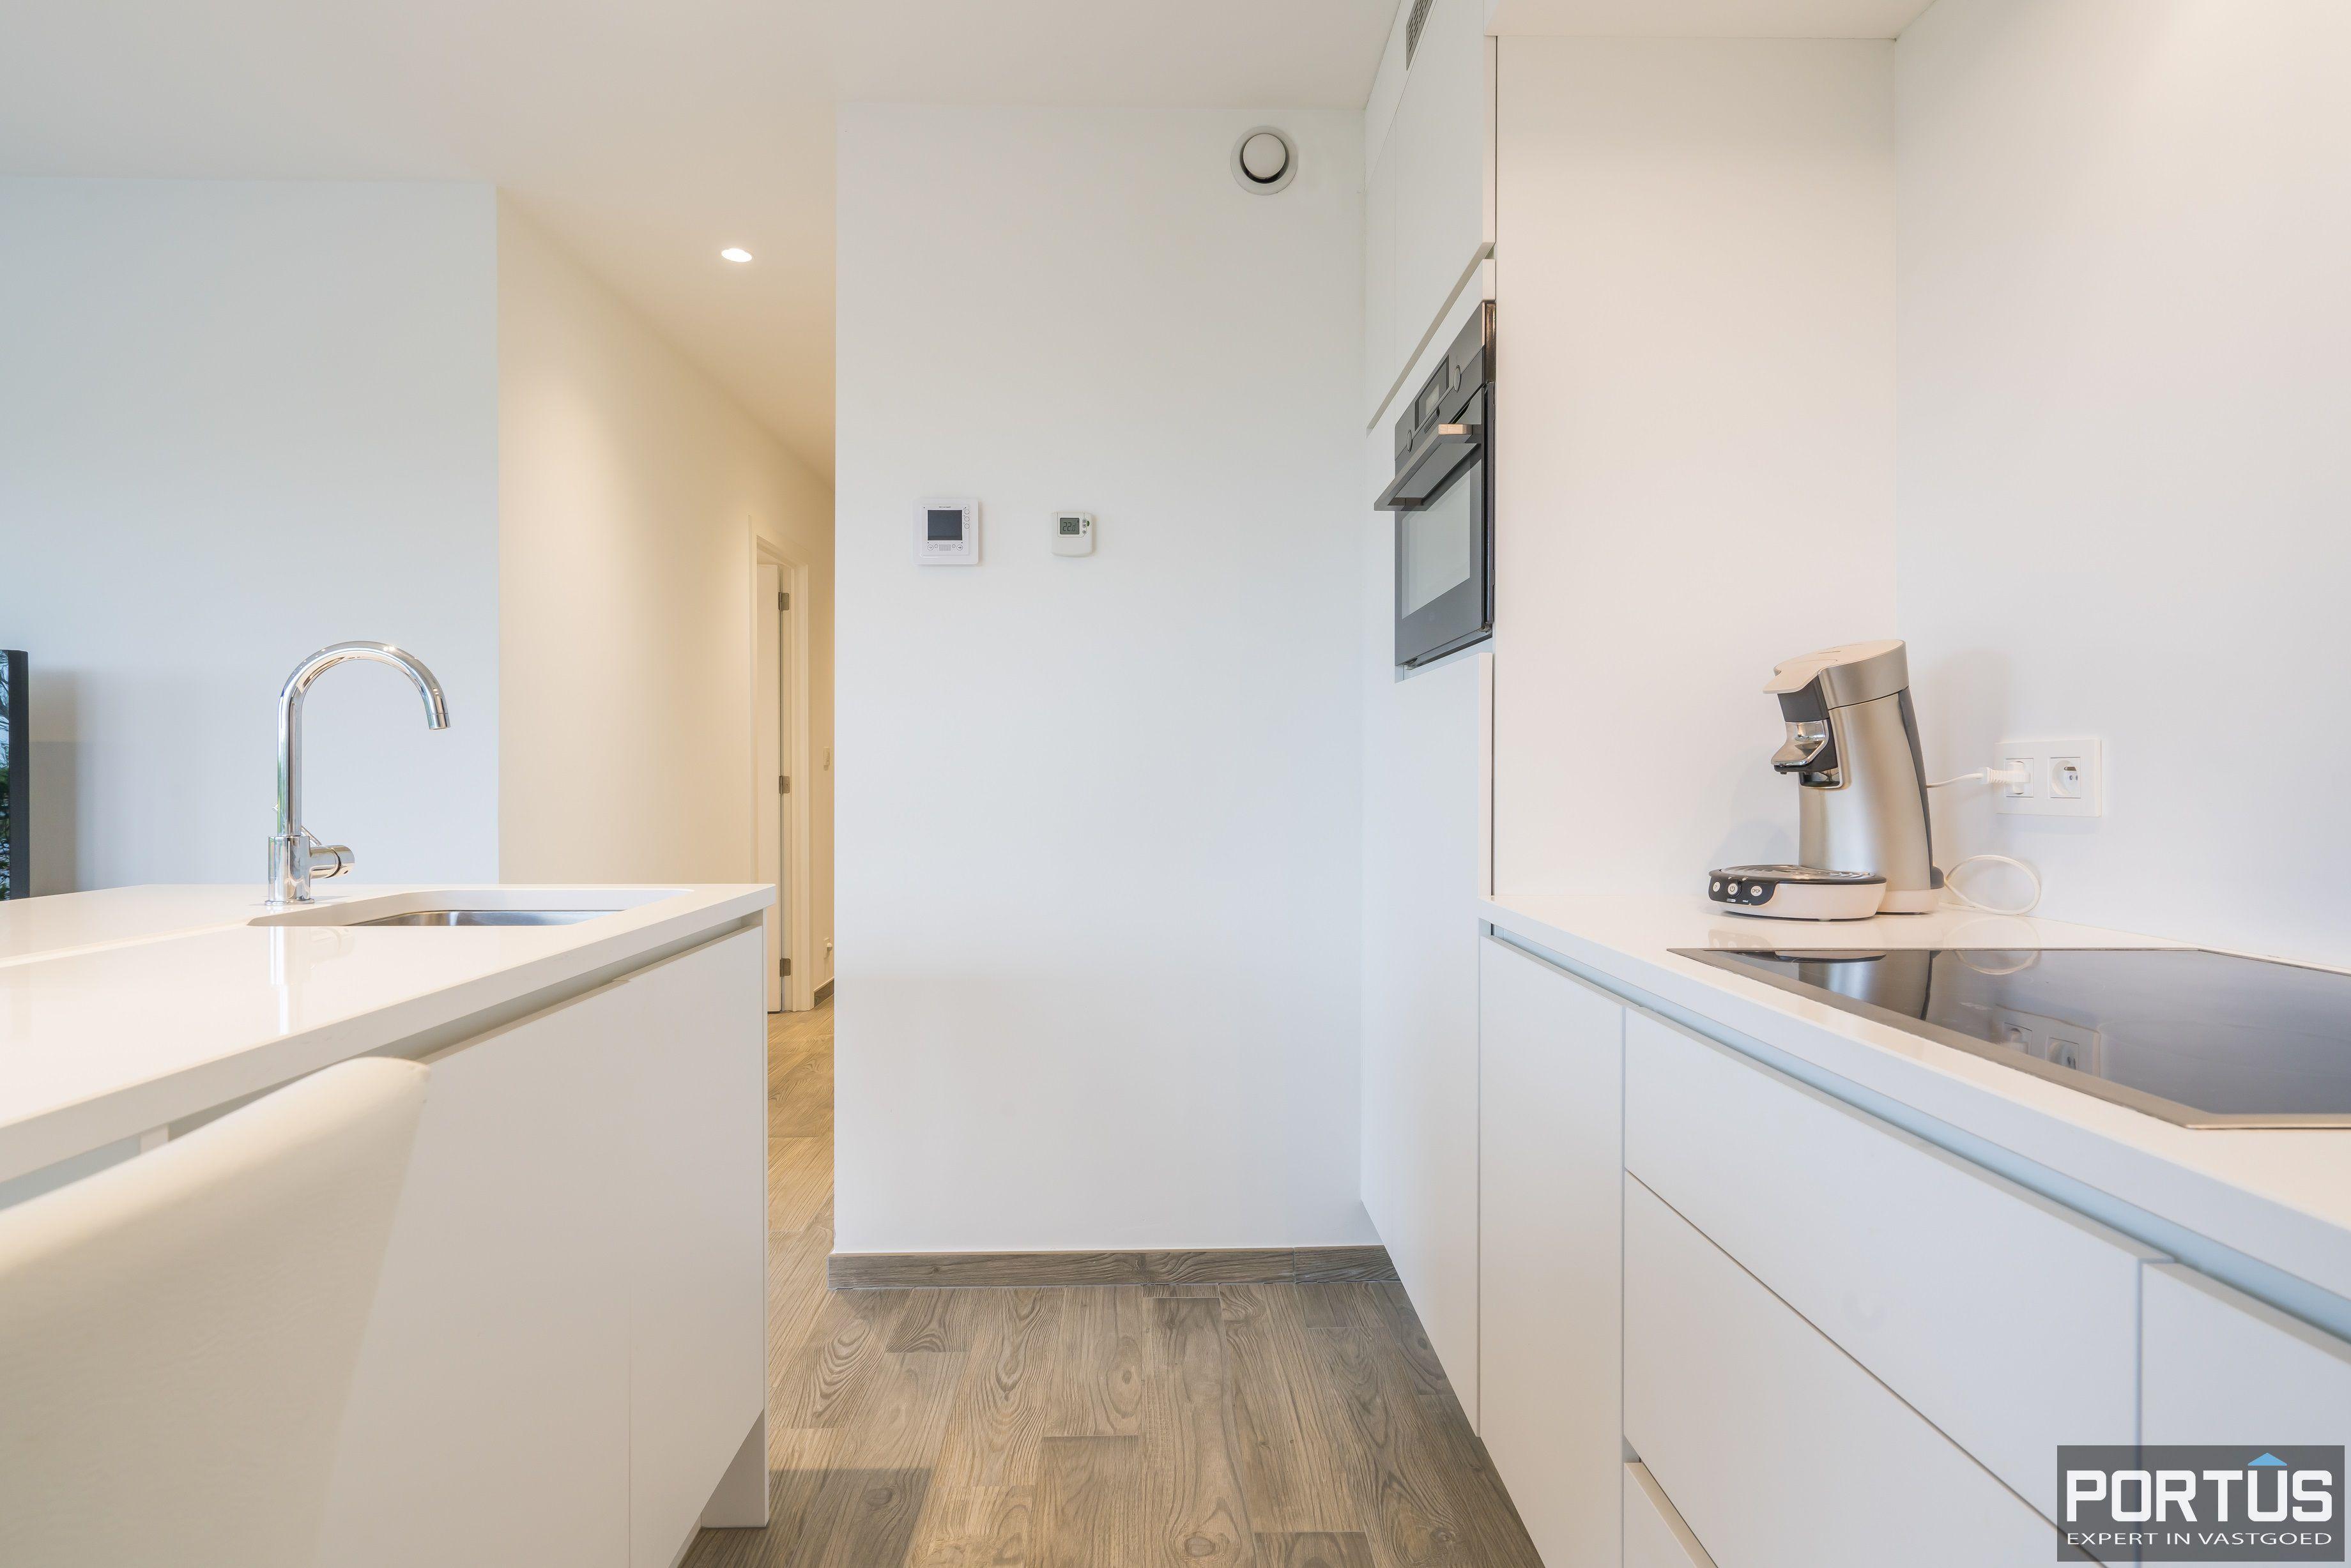 Appartement te koop met 2 slaapkamers in Residentie Waterfront te Nieuwpoort - 11865